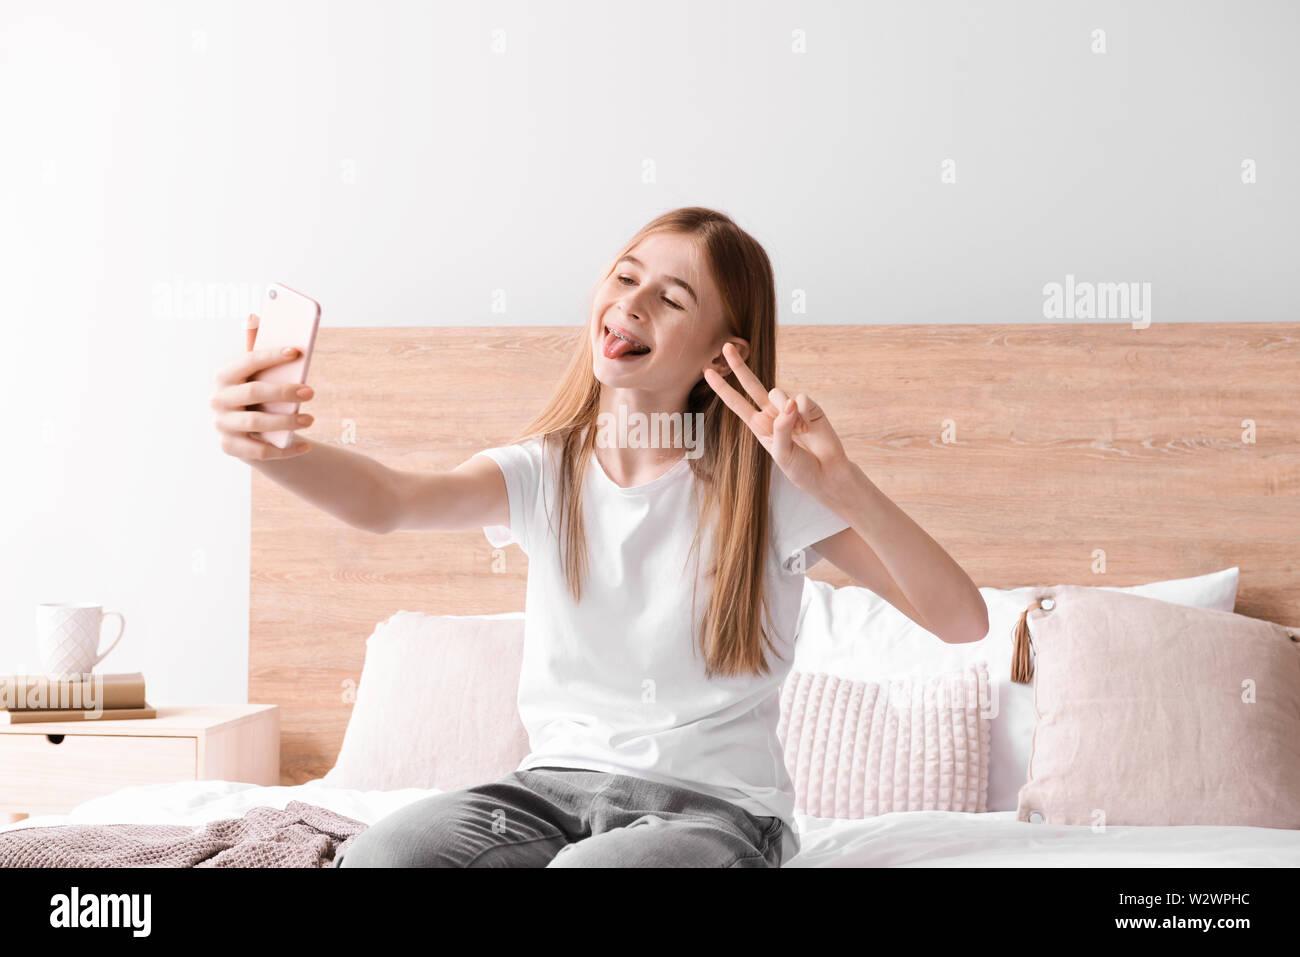 Cute Teenage Girl Taking Selfie In Bedroom At Home Stock Photo Alamy